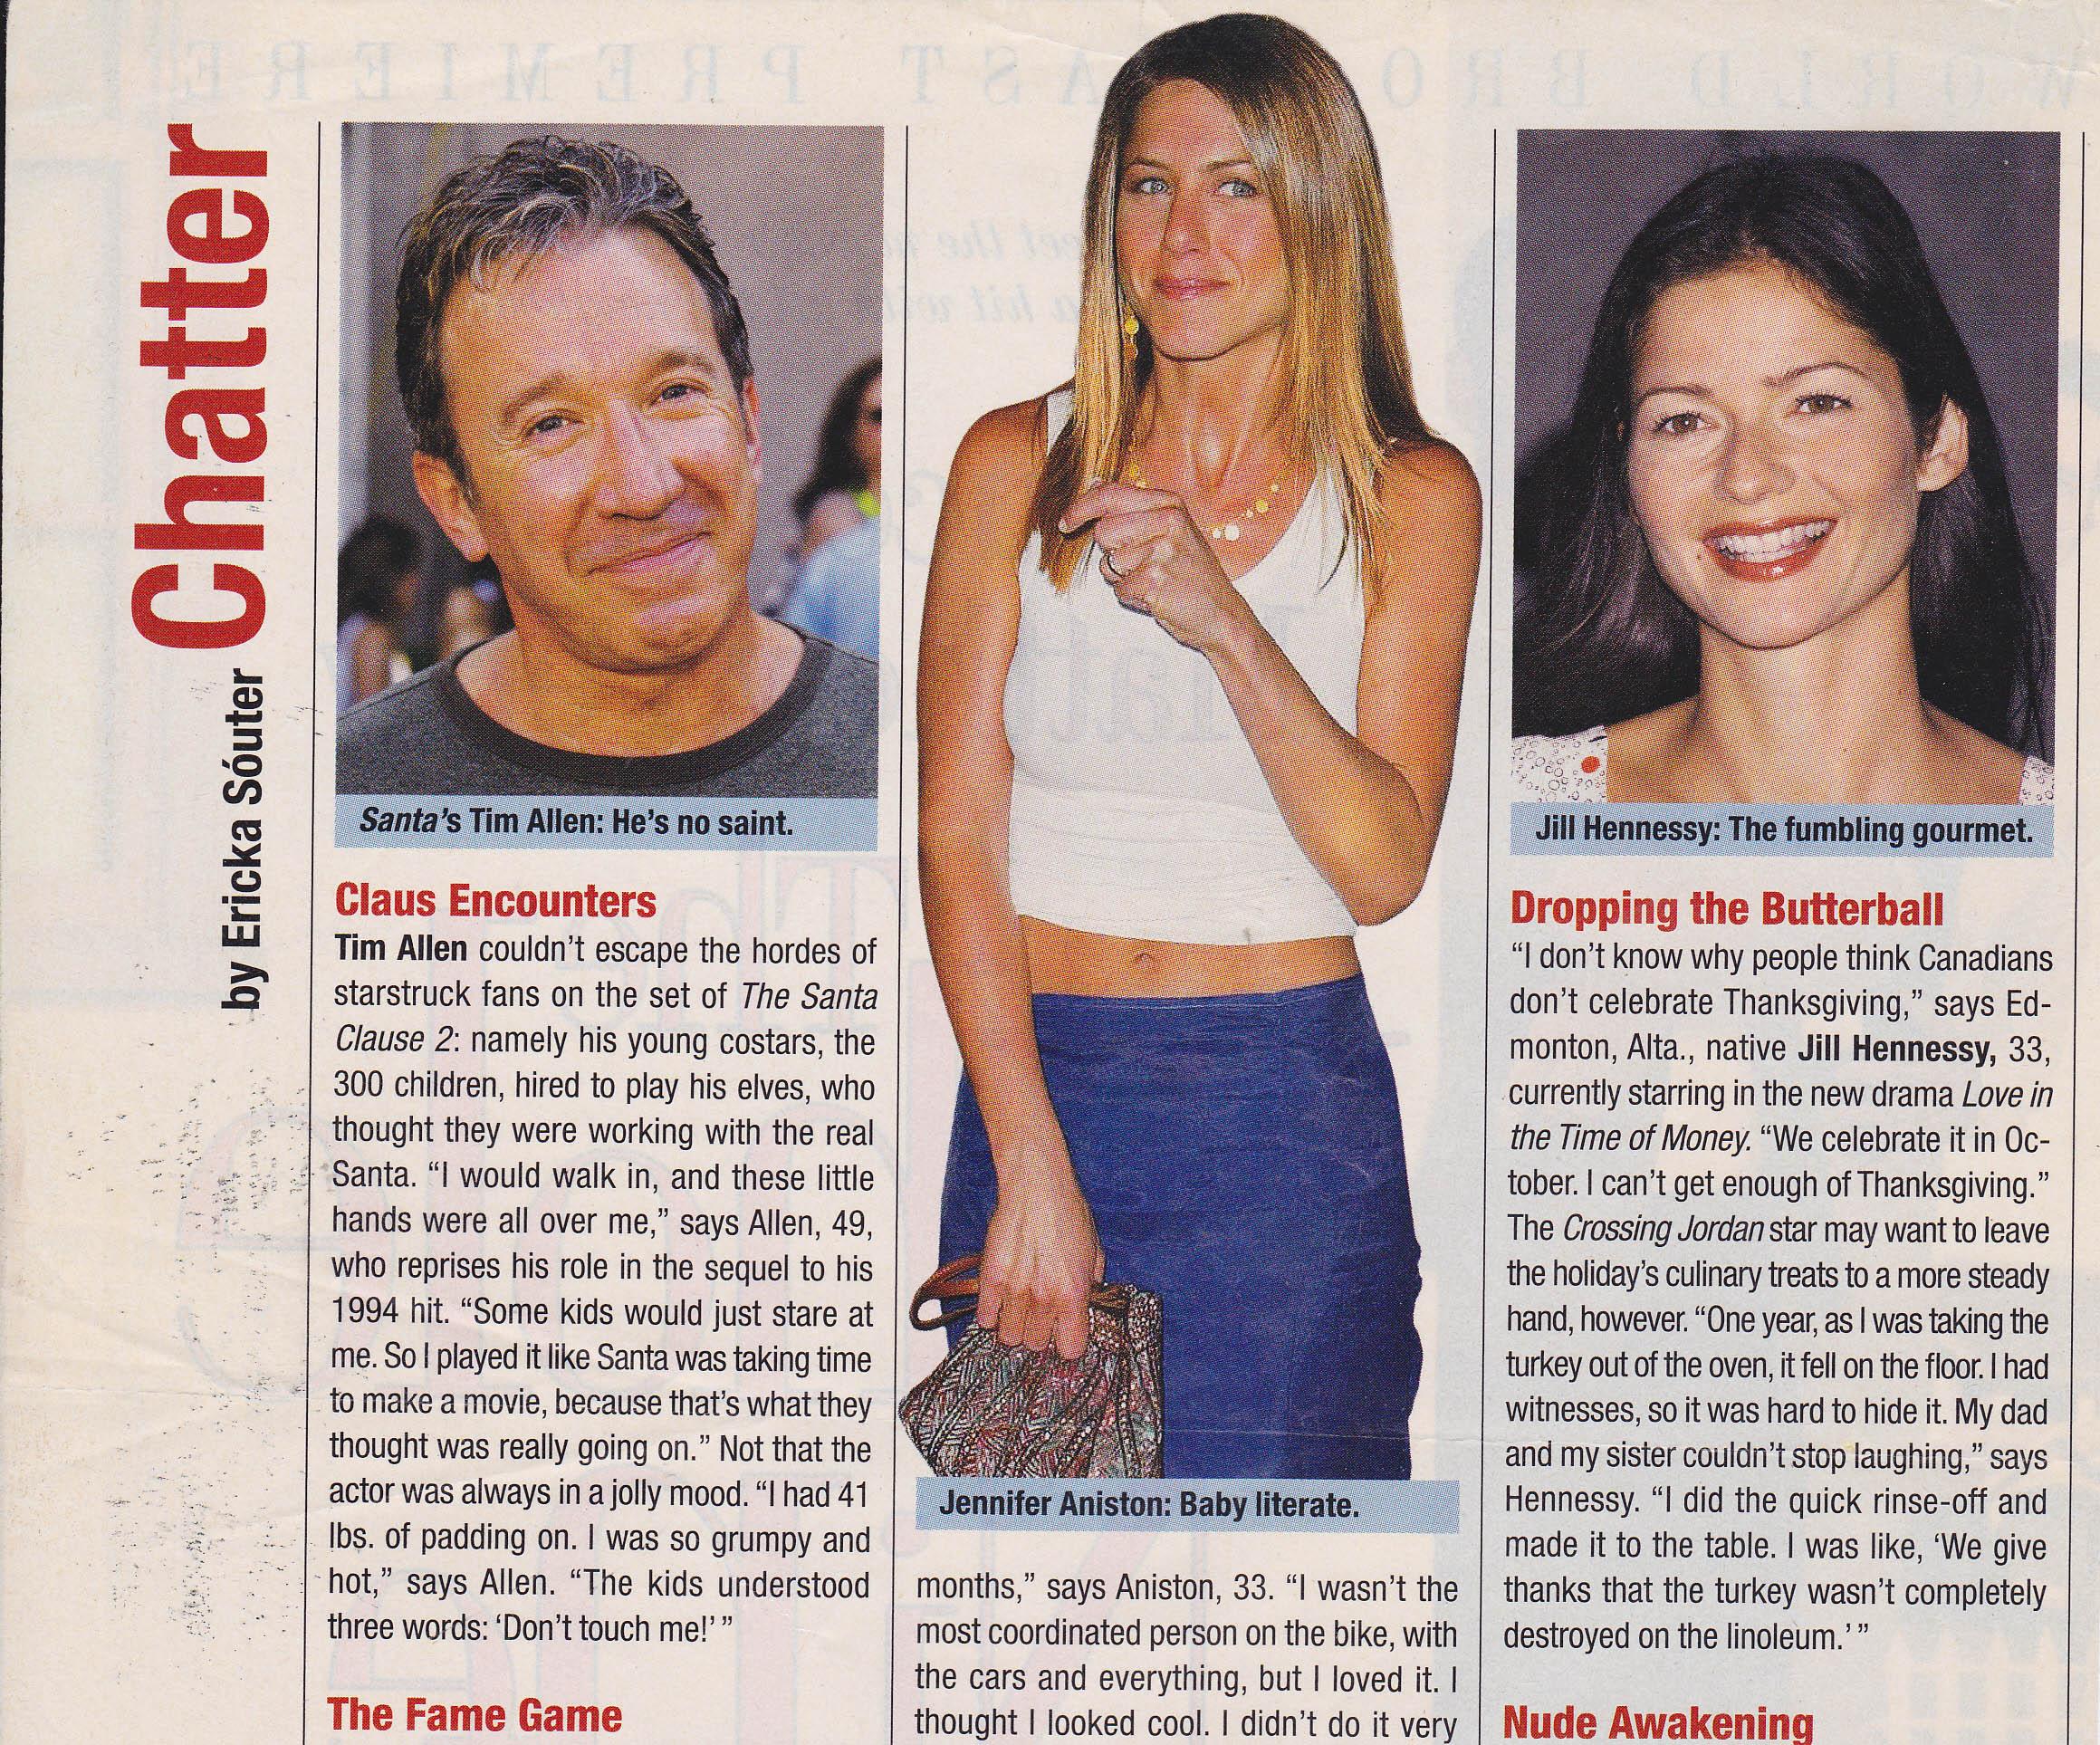 November 2002 People Magazine